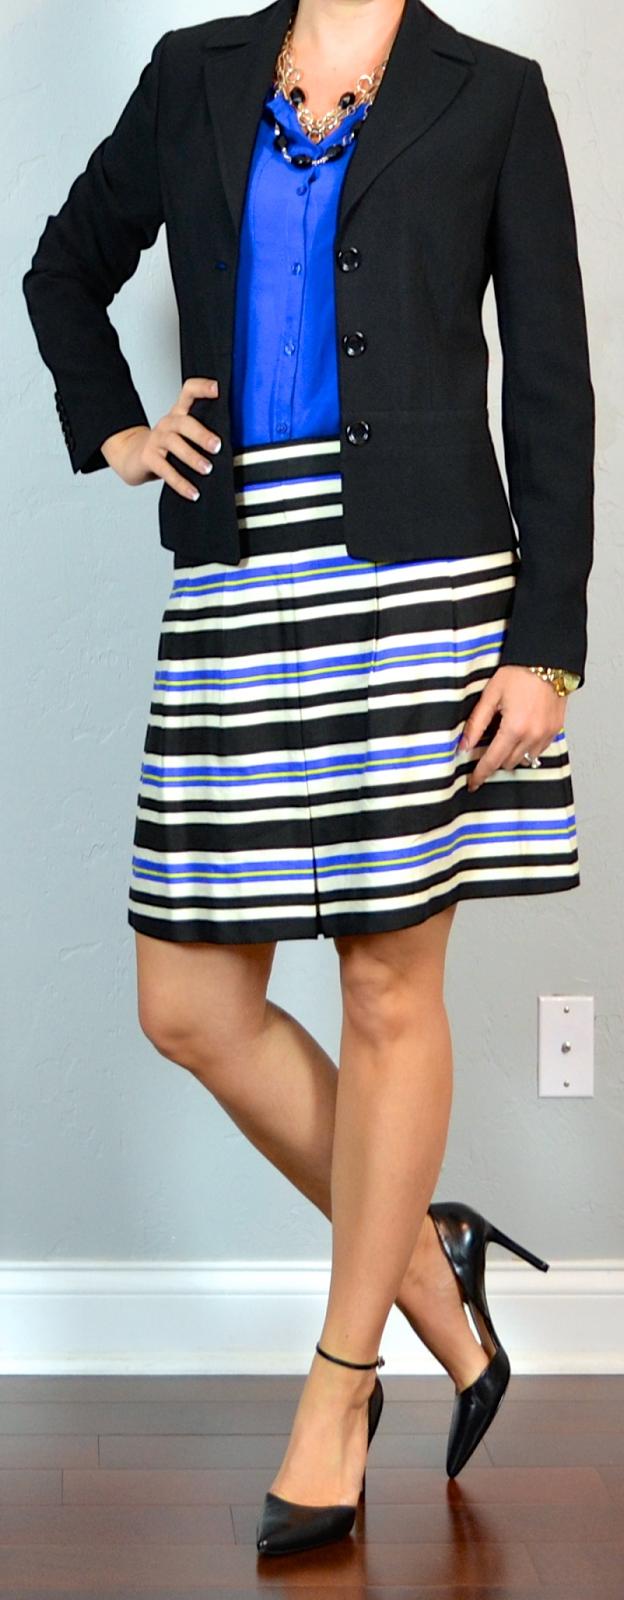 34db1-stripedjacket